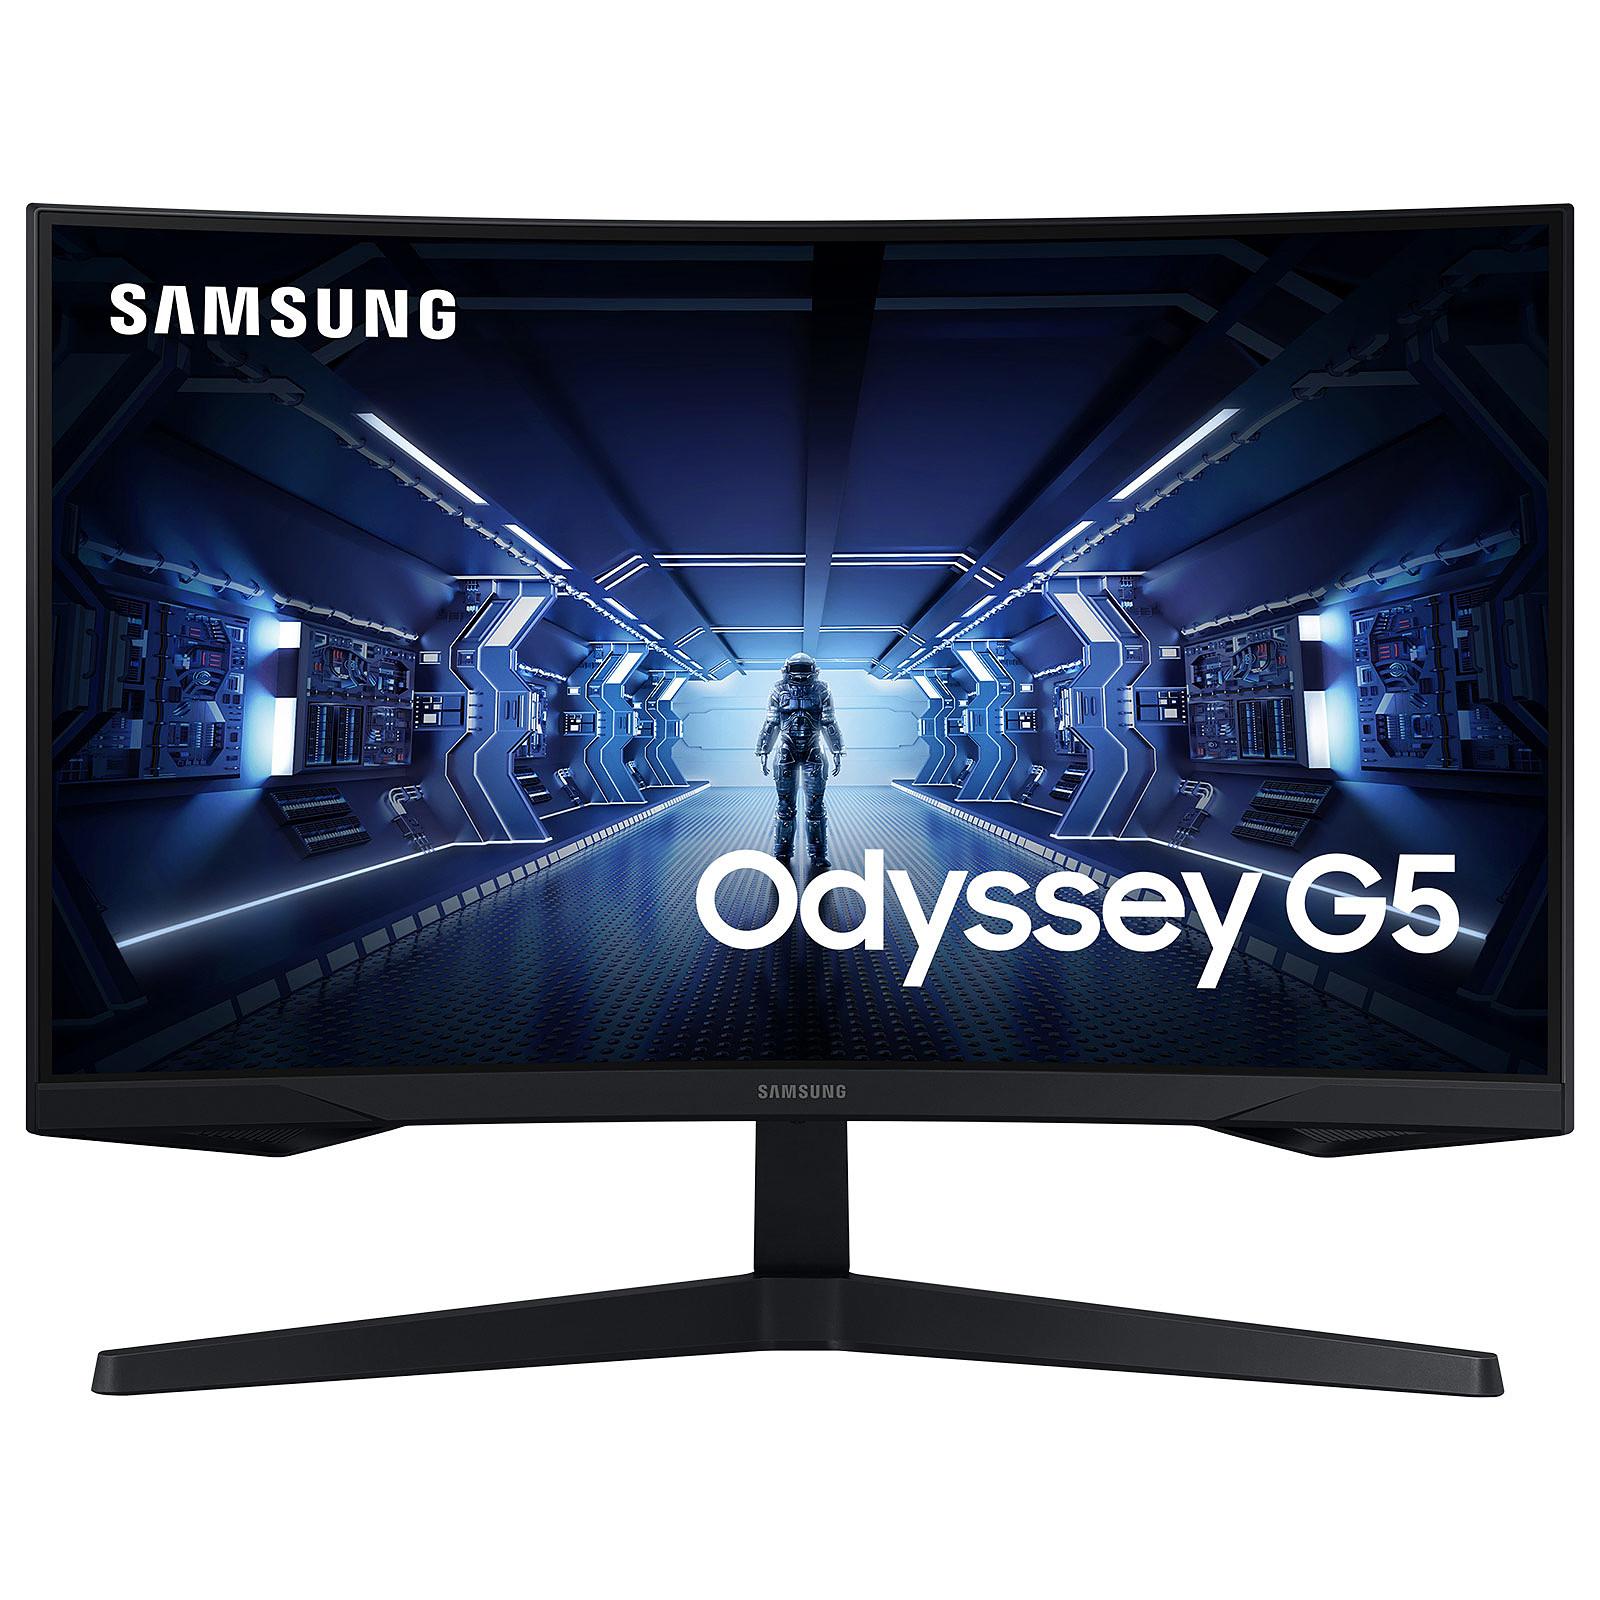 "Écran PC Incurvé 27"" Samsung Odyssey G5 - WQHD (2560 x 1440), 144 Hz, Dalle VA, 1 ms, AMD FreeSync Premium"